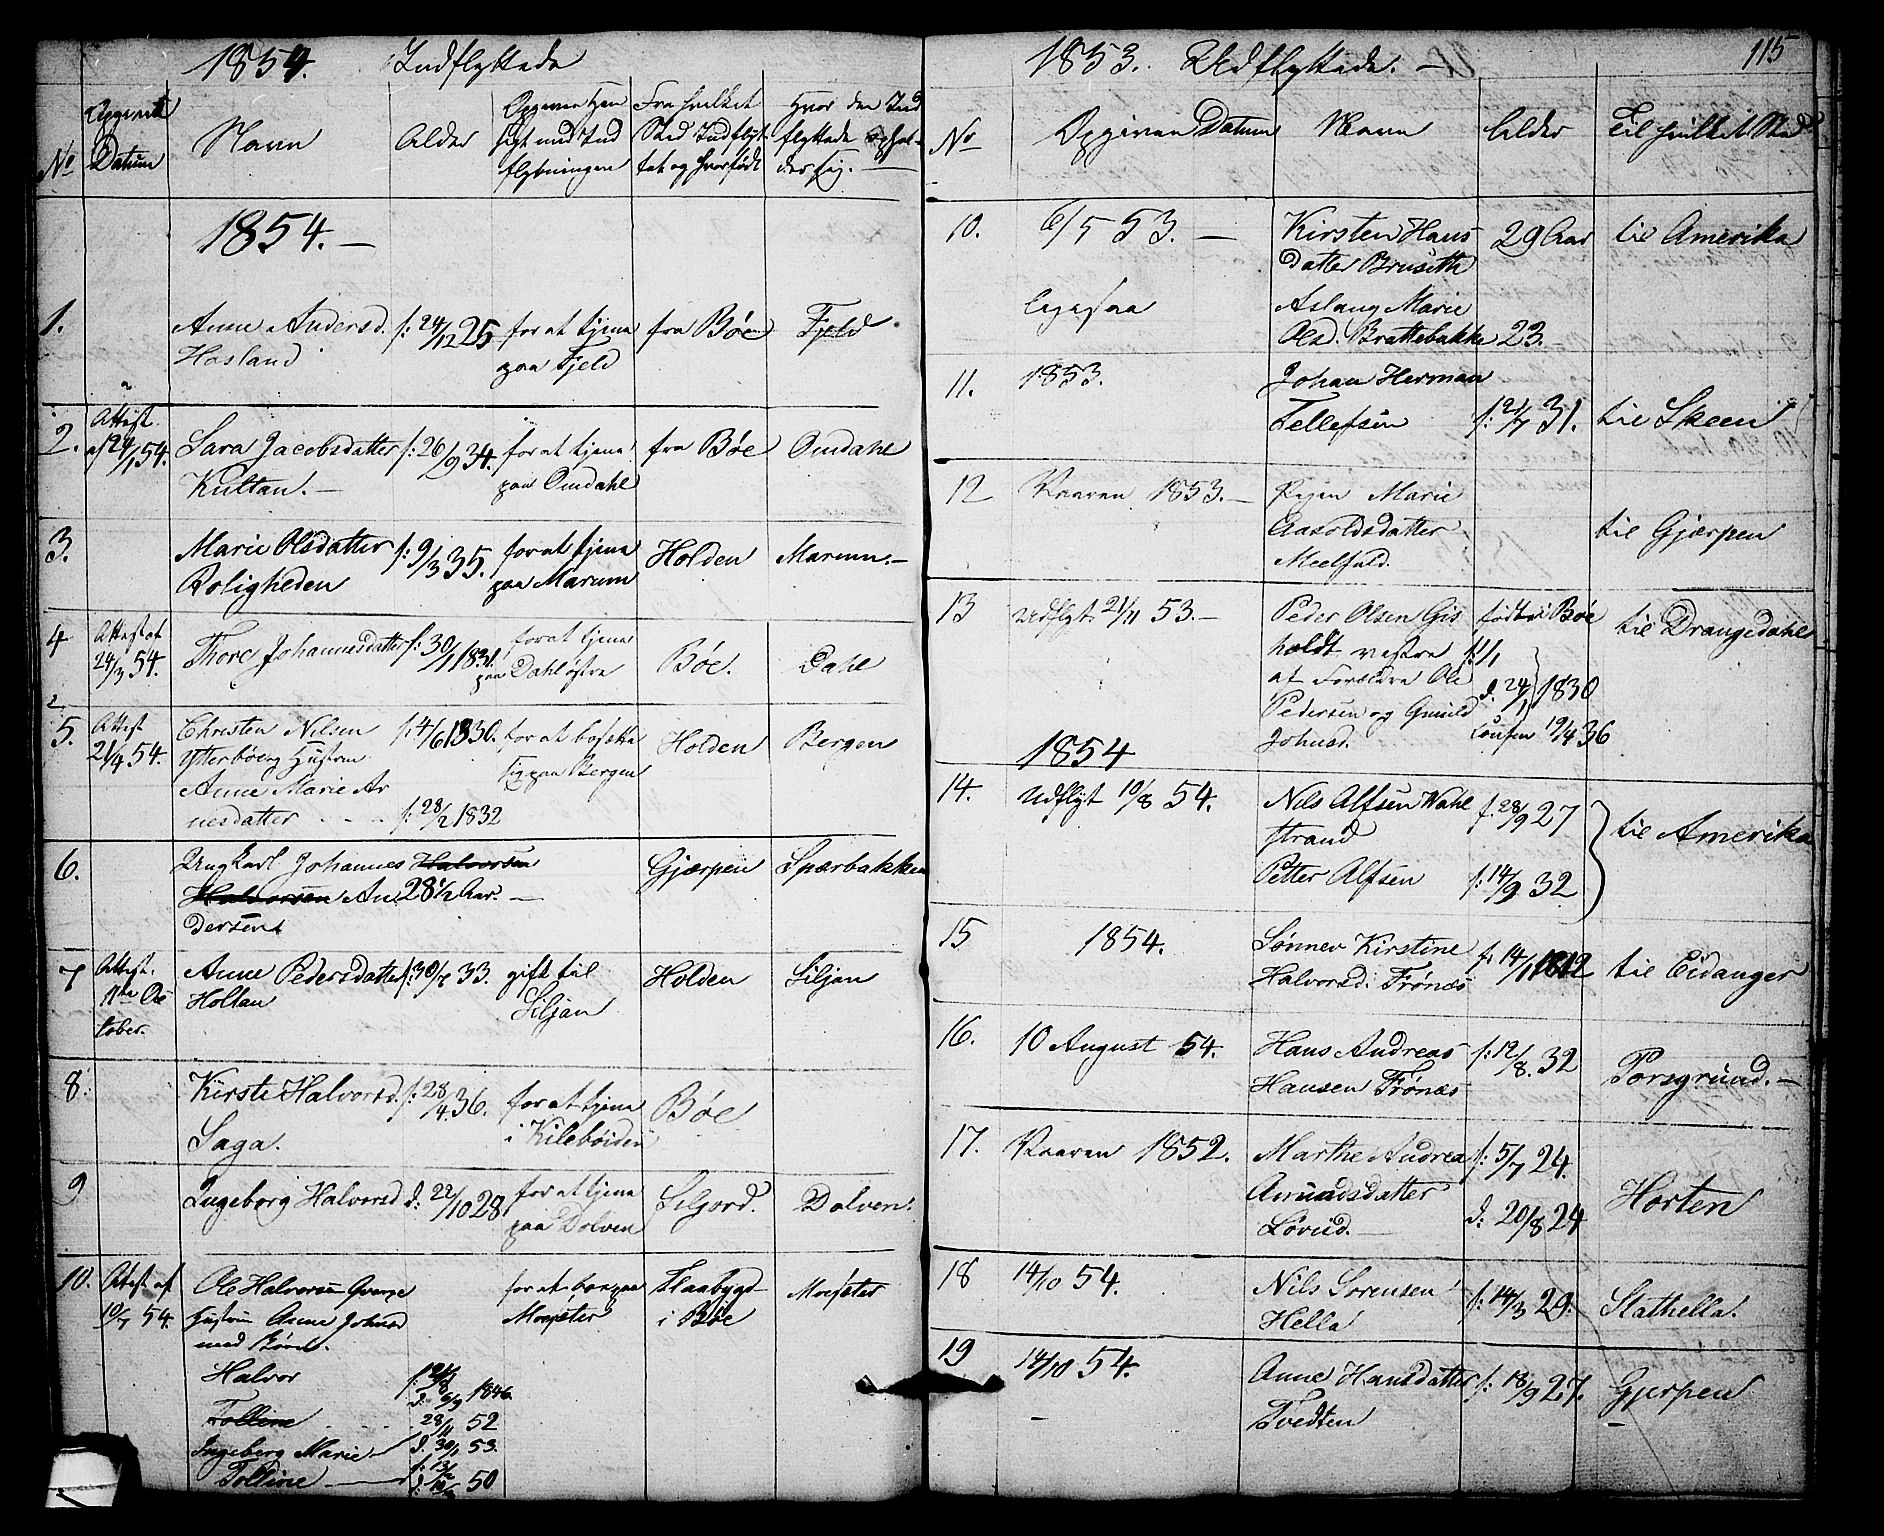 SAKO, Solum kirkebøker, G/Gb/L0001: Klokkerbok nr. II 1, 1848-1859, s. 115